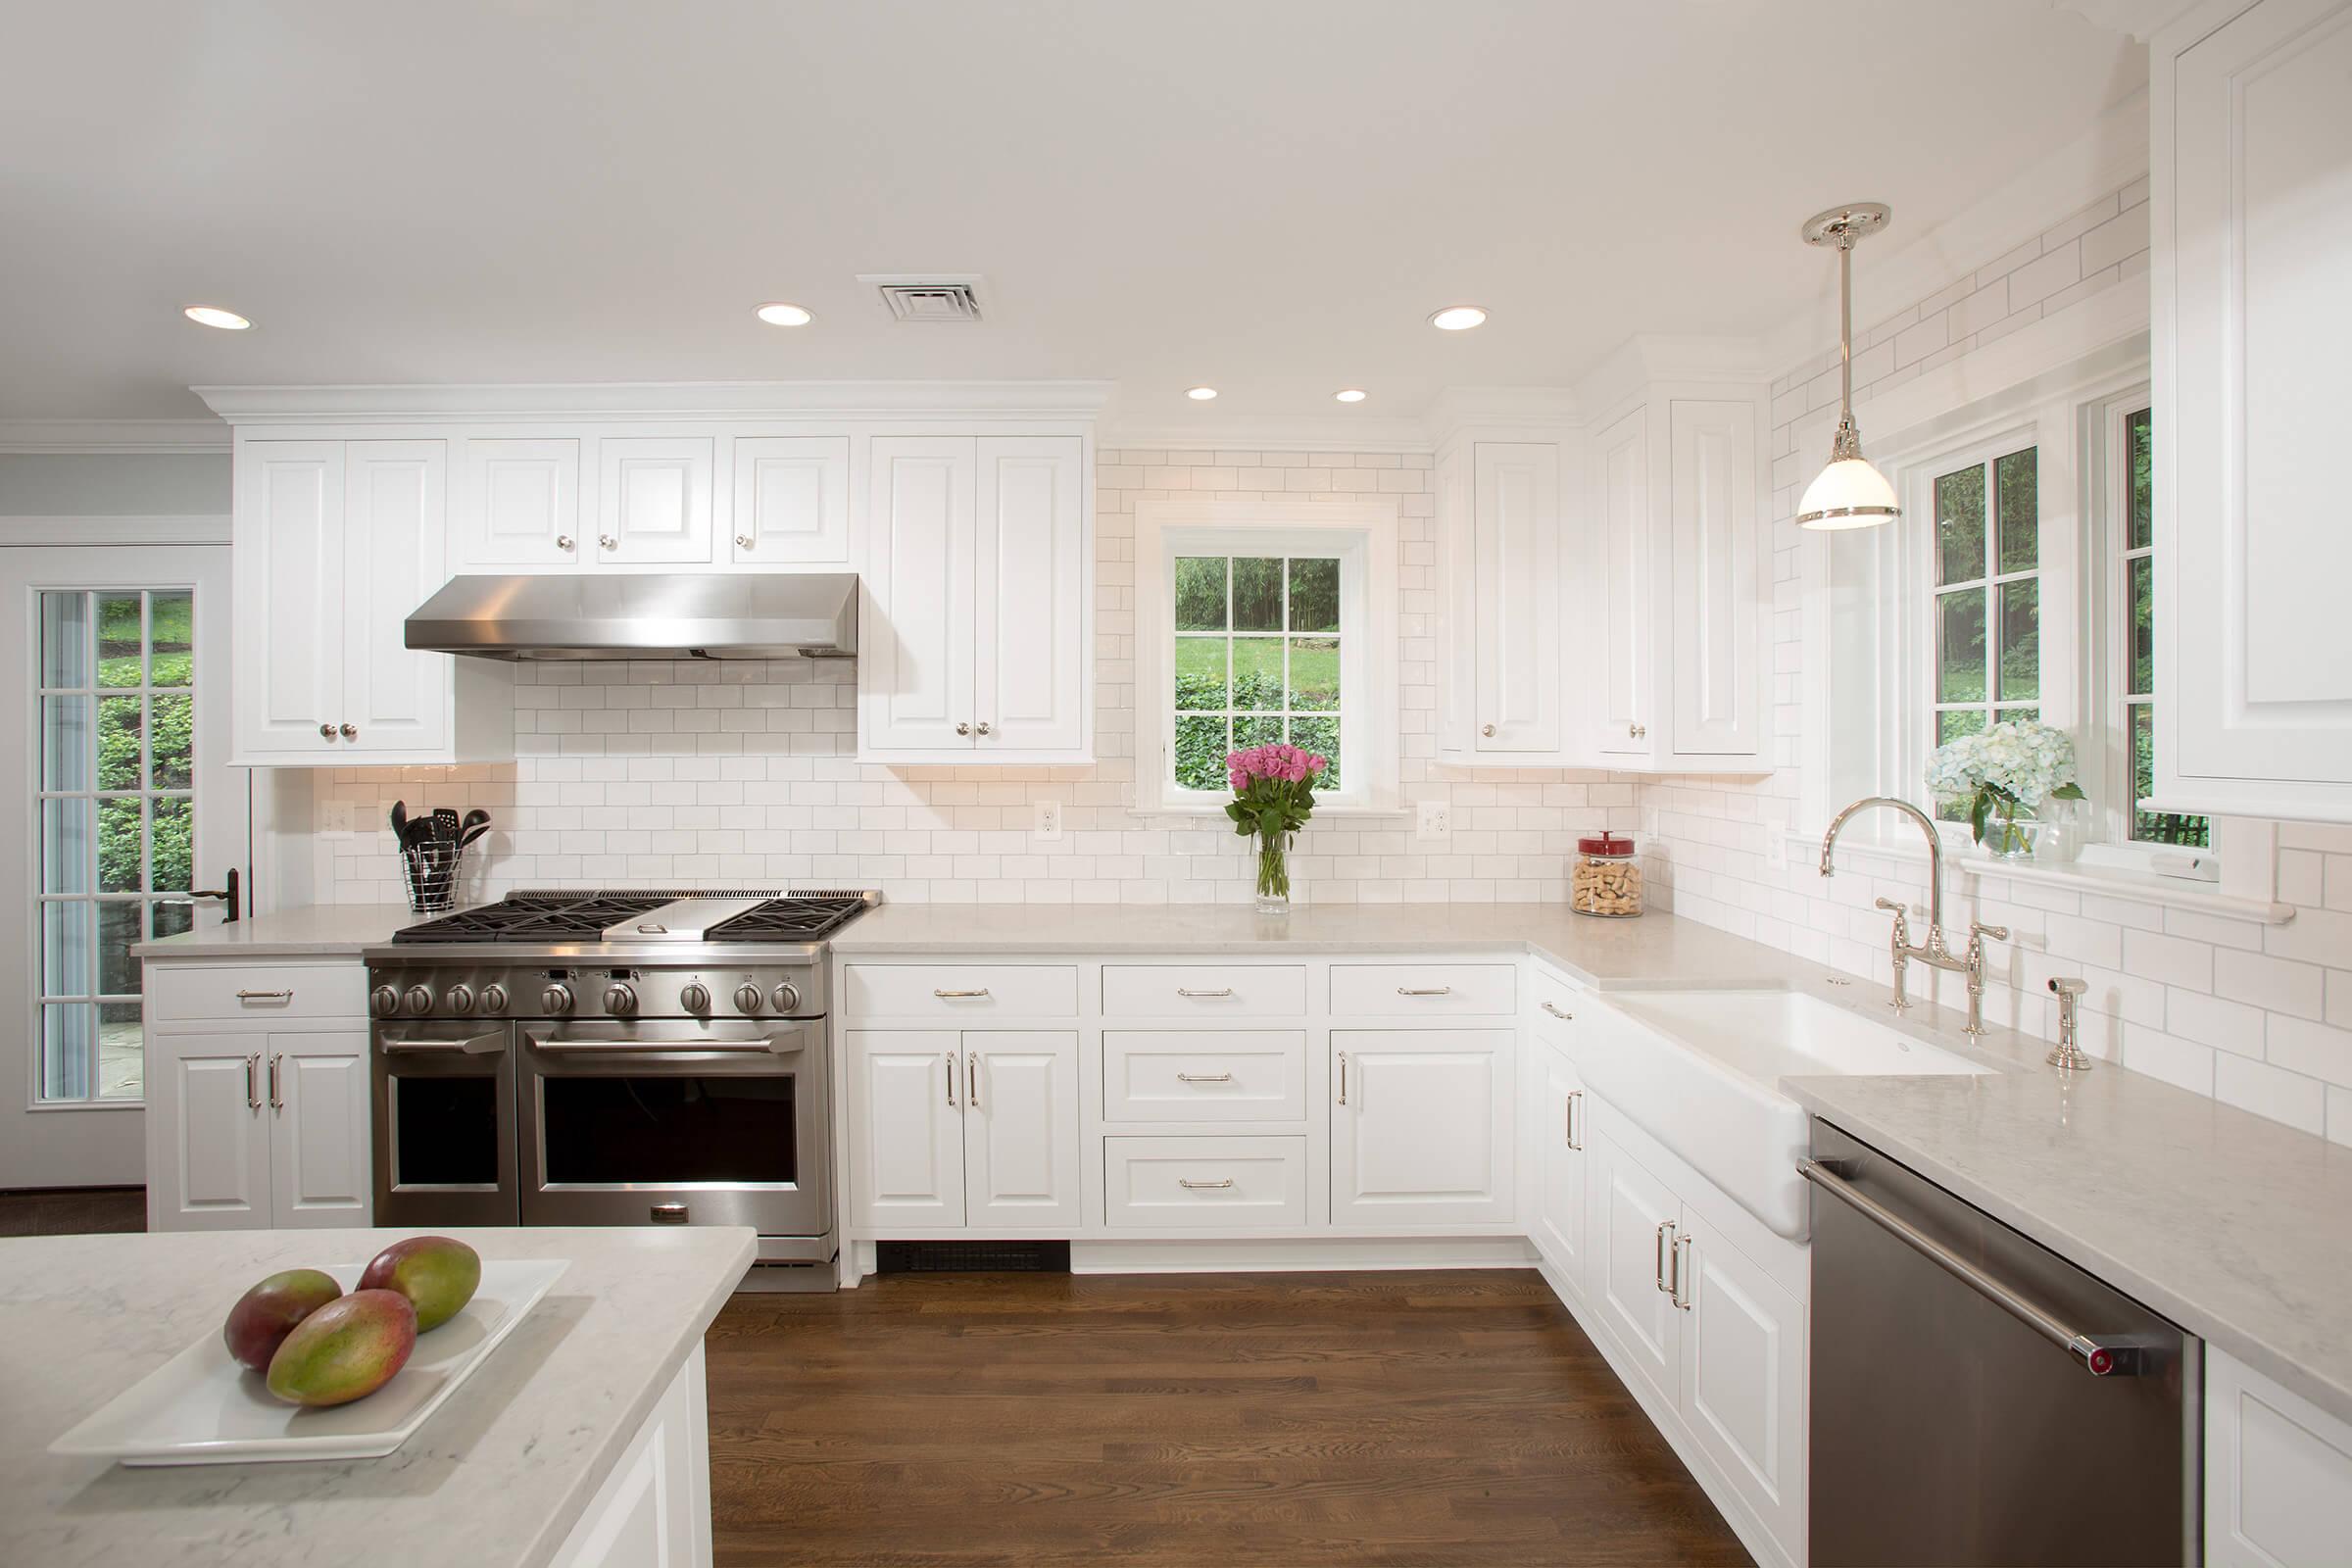 Kitchen Renovation Opens First Floor Of 1930s Belle Haven